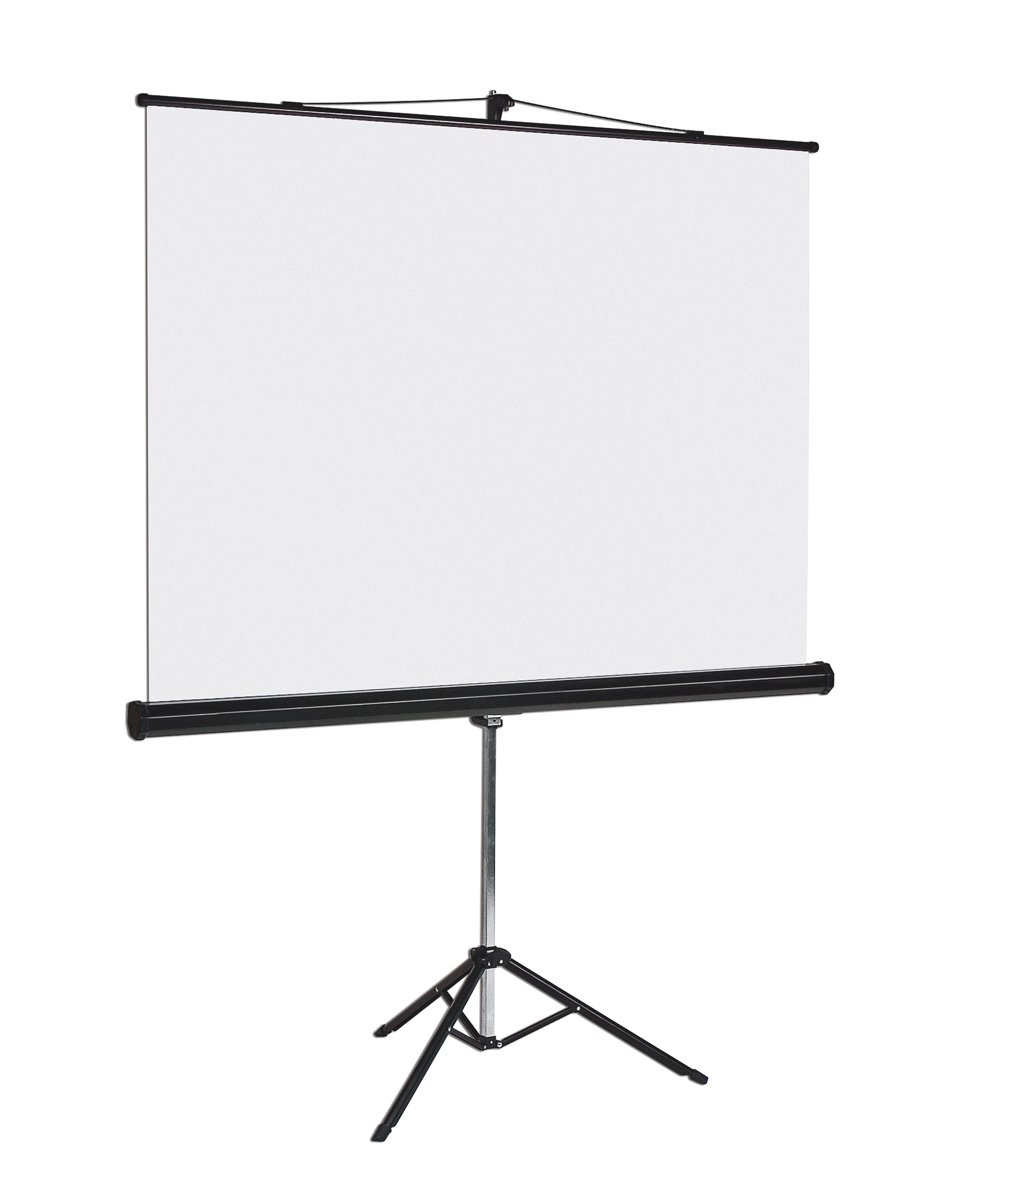 Bi-Office - Pantalla de proyección con trípode, 1250 x 1250 mm ...